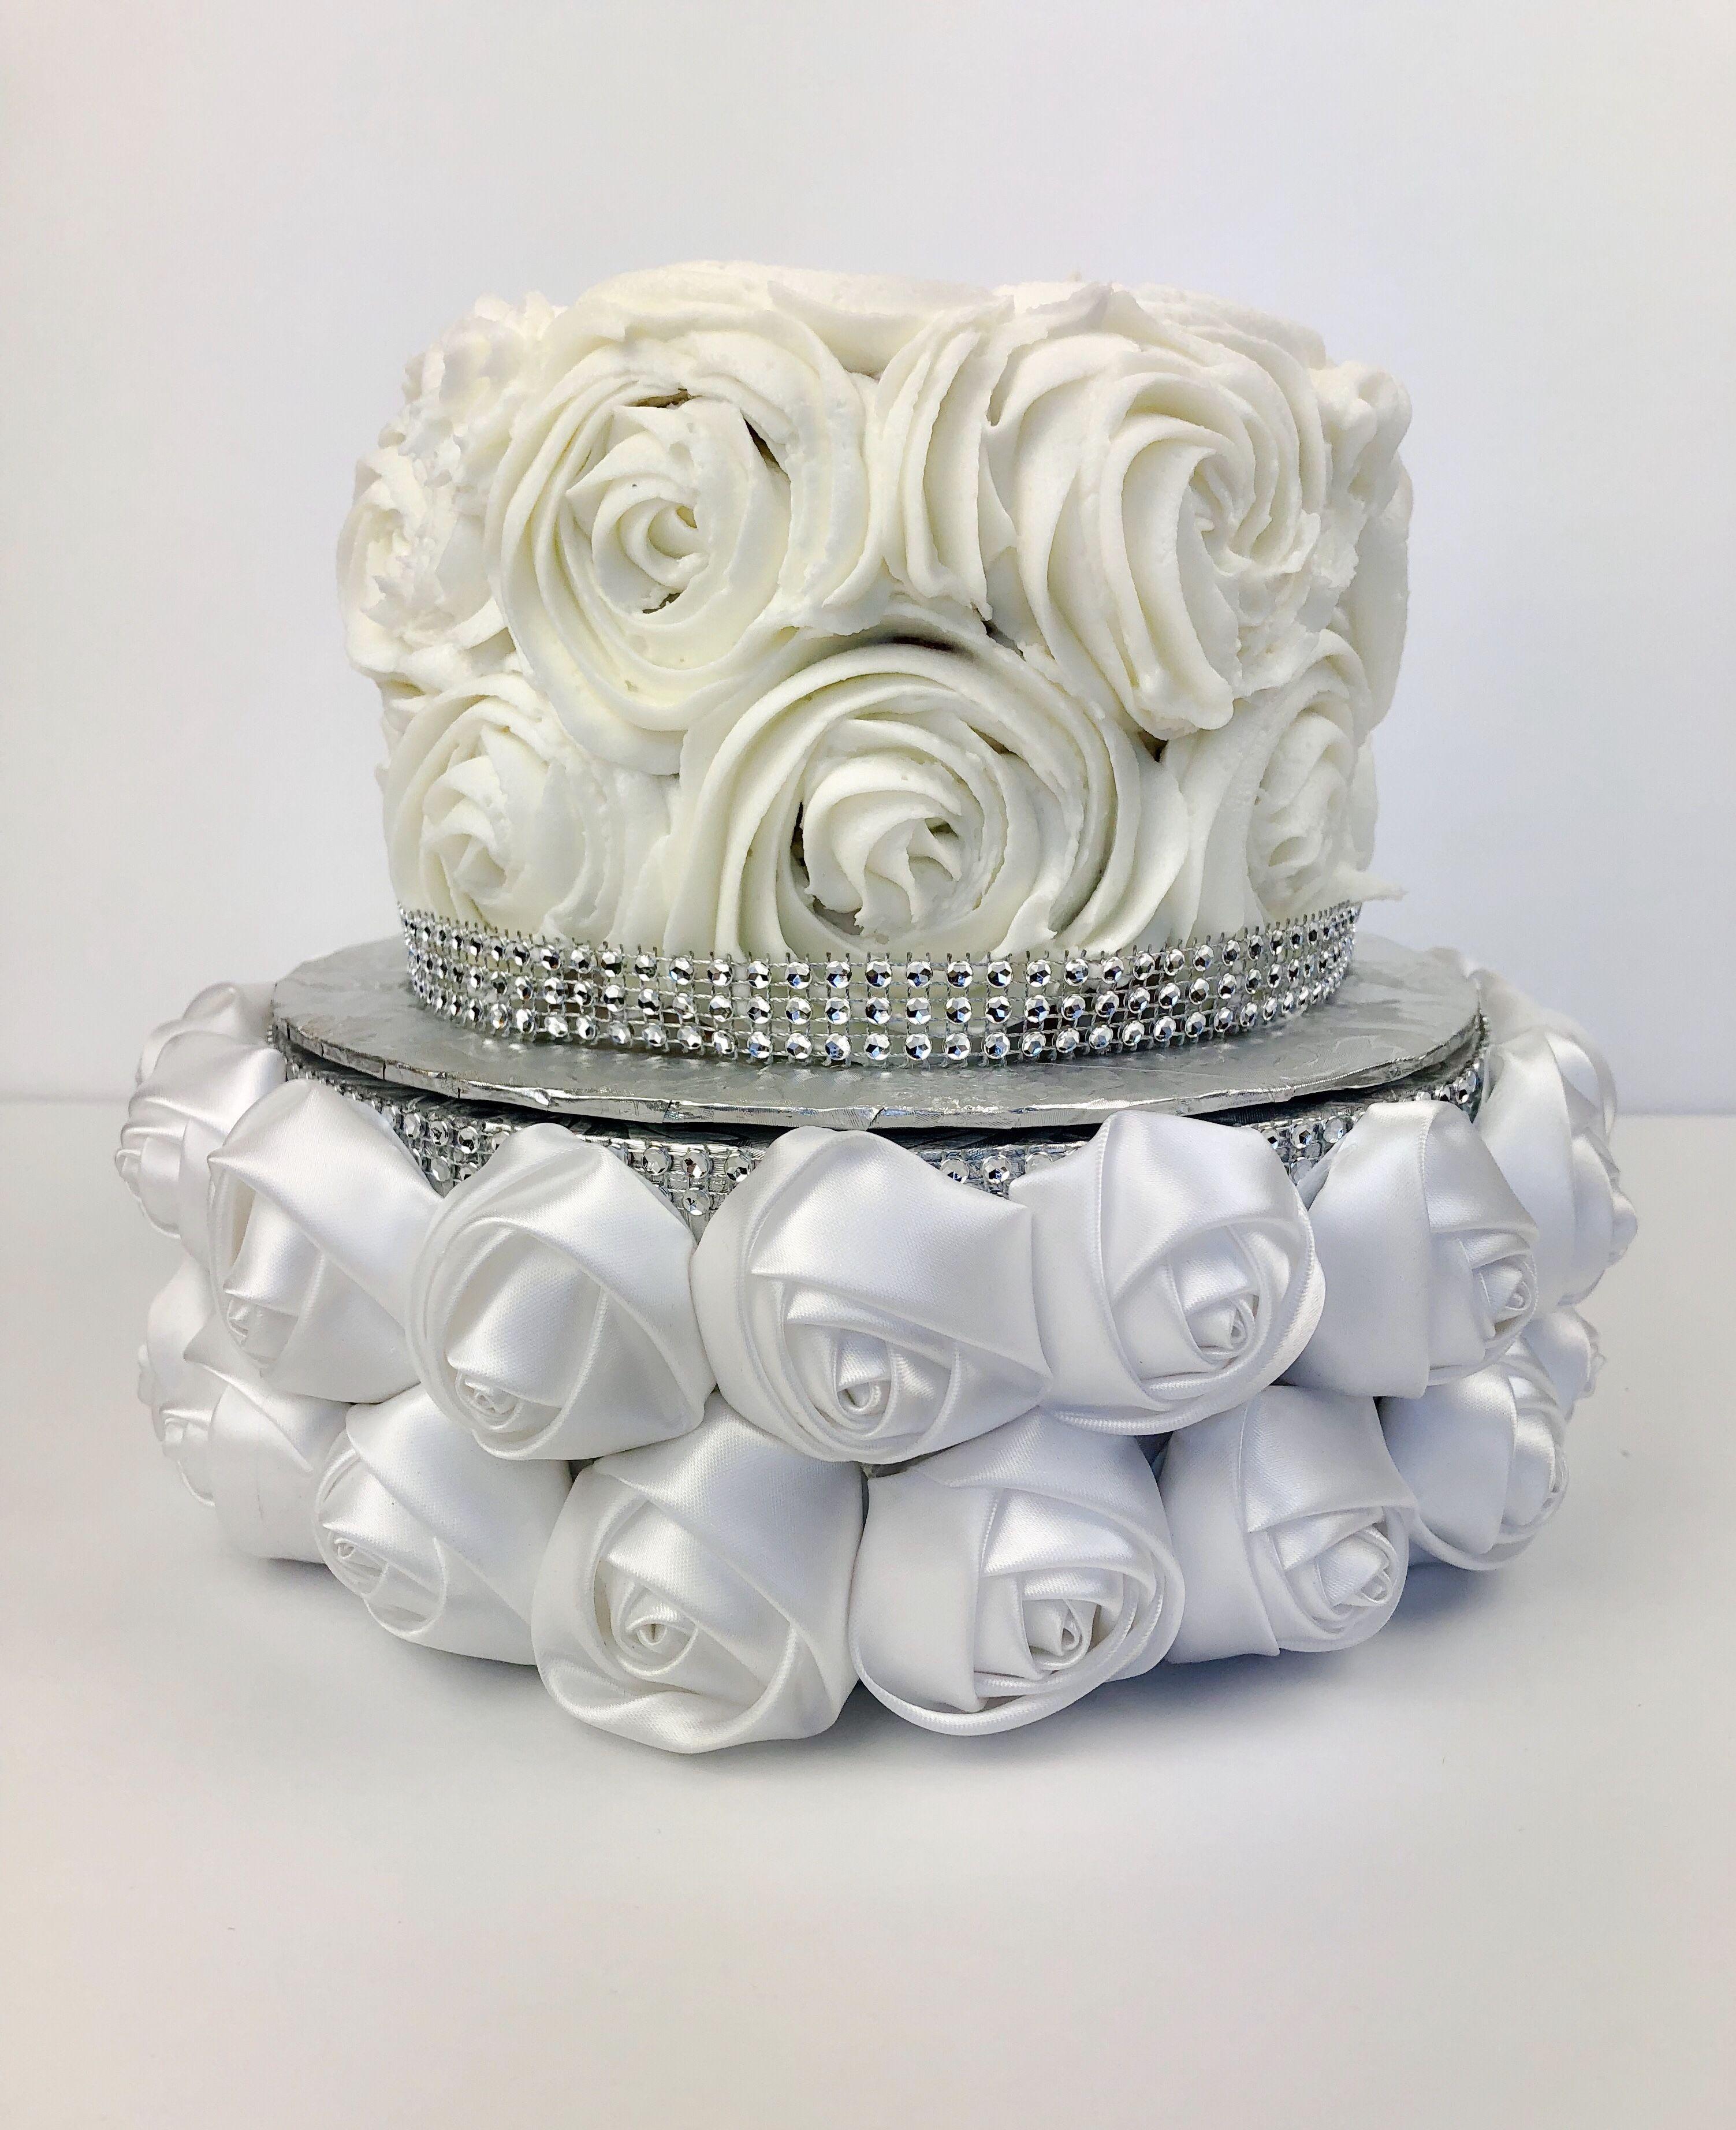 Cake Stand Cupcake Stand Wedding Cake Stand Gold Cake Stand Wedding ...